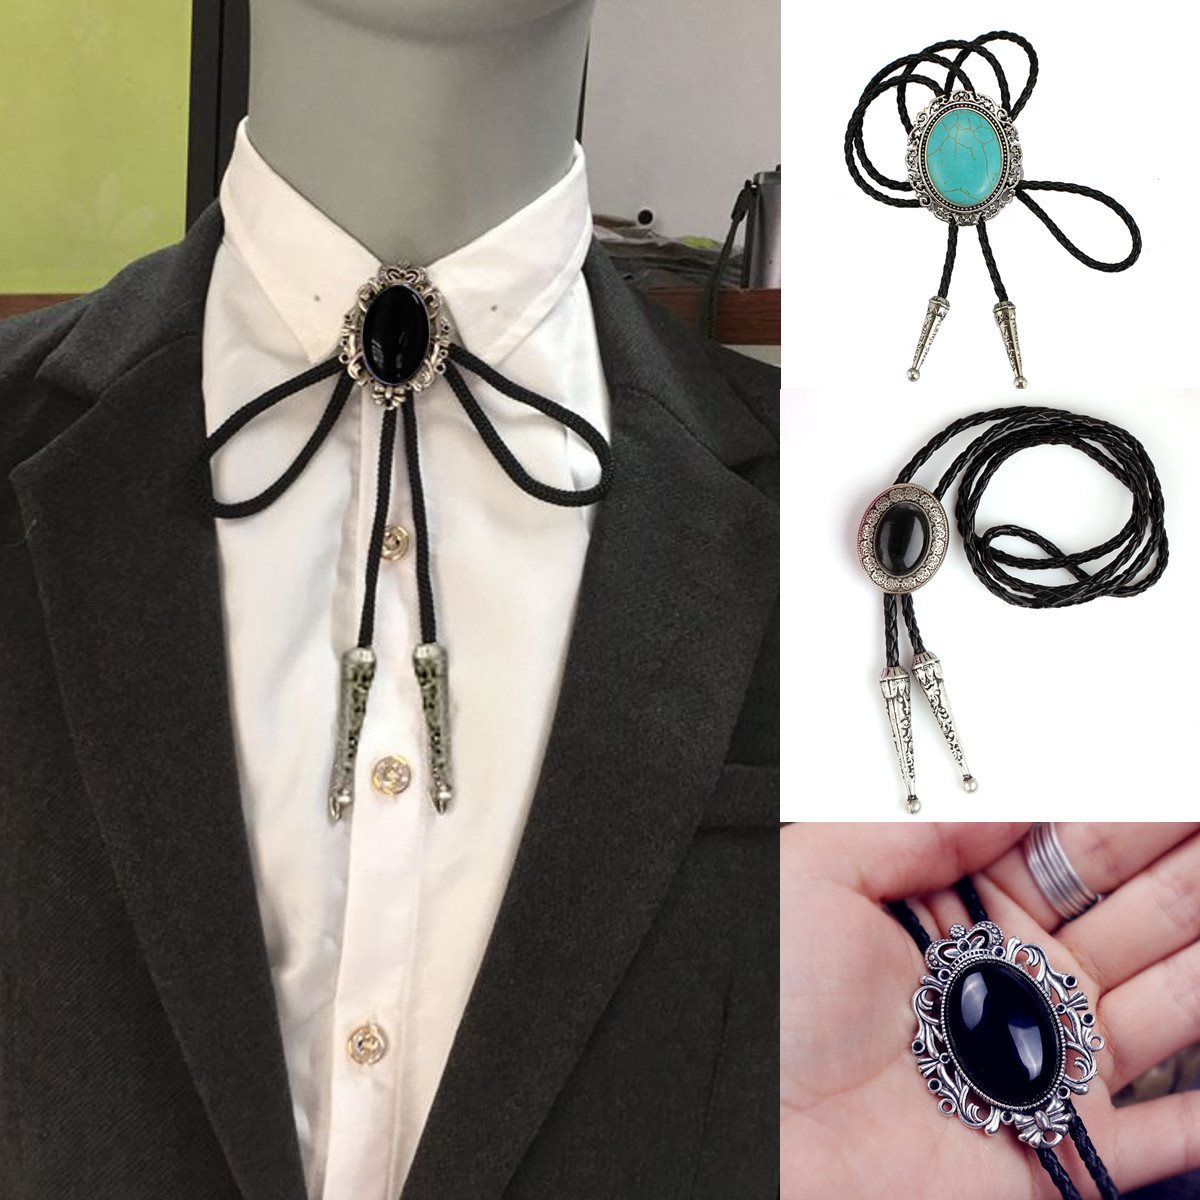 6dca037e9525 Indian Rhinestone Bolo Tie Dance Bola Tie PU Leather Necklace Flower Necktie  Black Opal Western Cowboy Men Chain